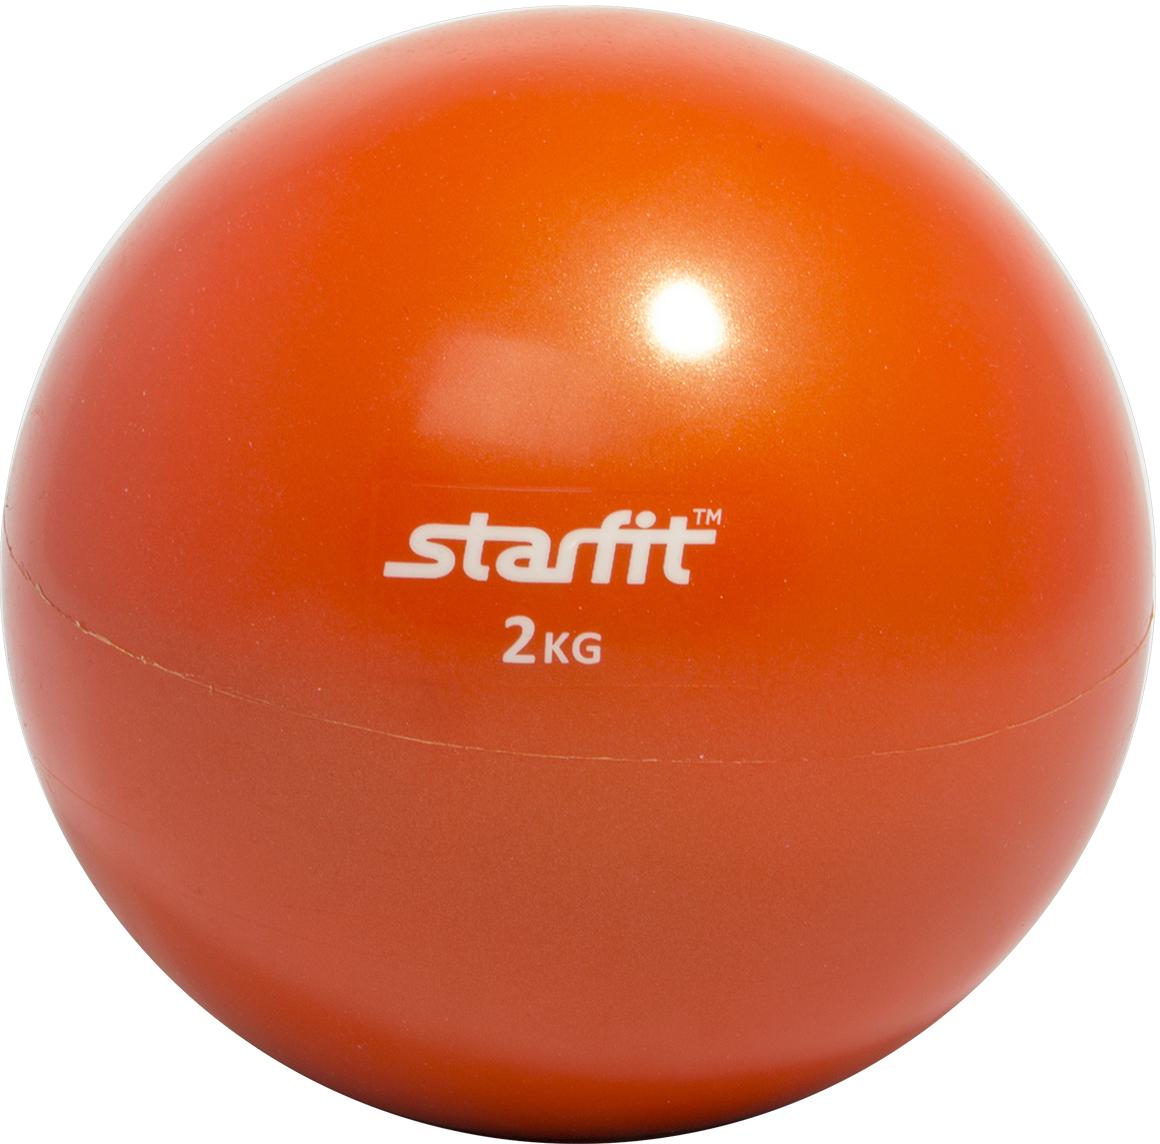 Медицинбол Starfit GB-703, цвет: оранжевый, 2 кг эспандеры starfit эспандер starfit es 702 power twister черный 50 кг